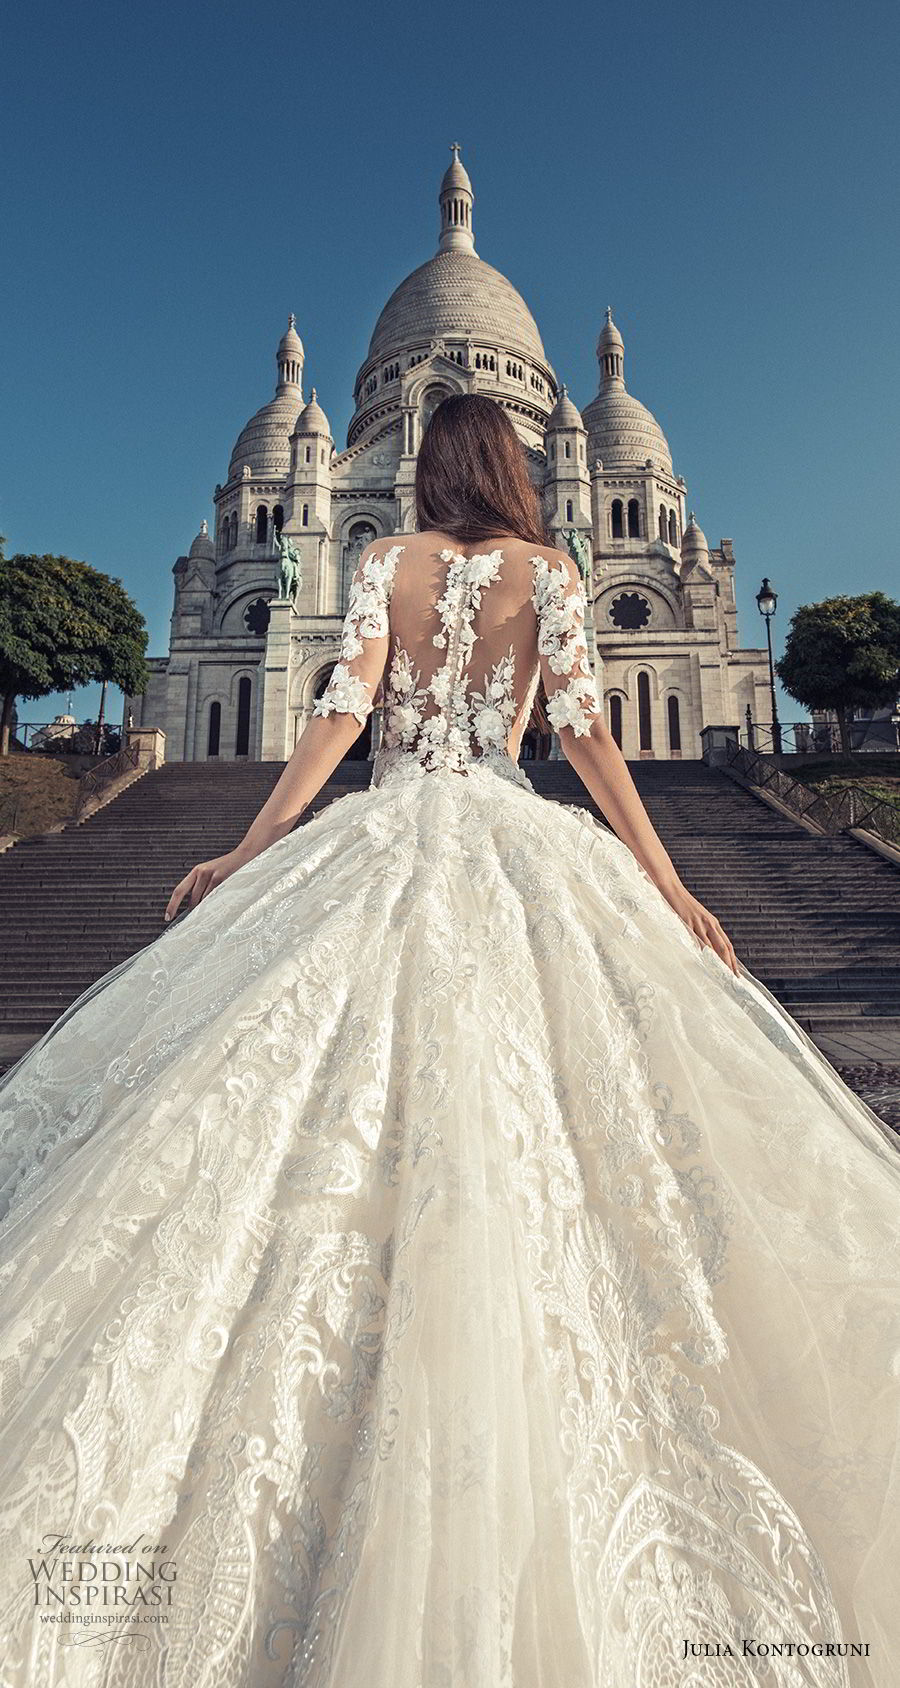 julia kontogruni wedding dresses 2018 � �paris� bridal